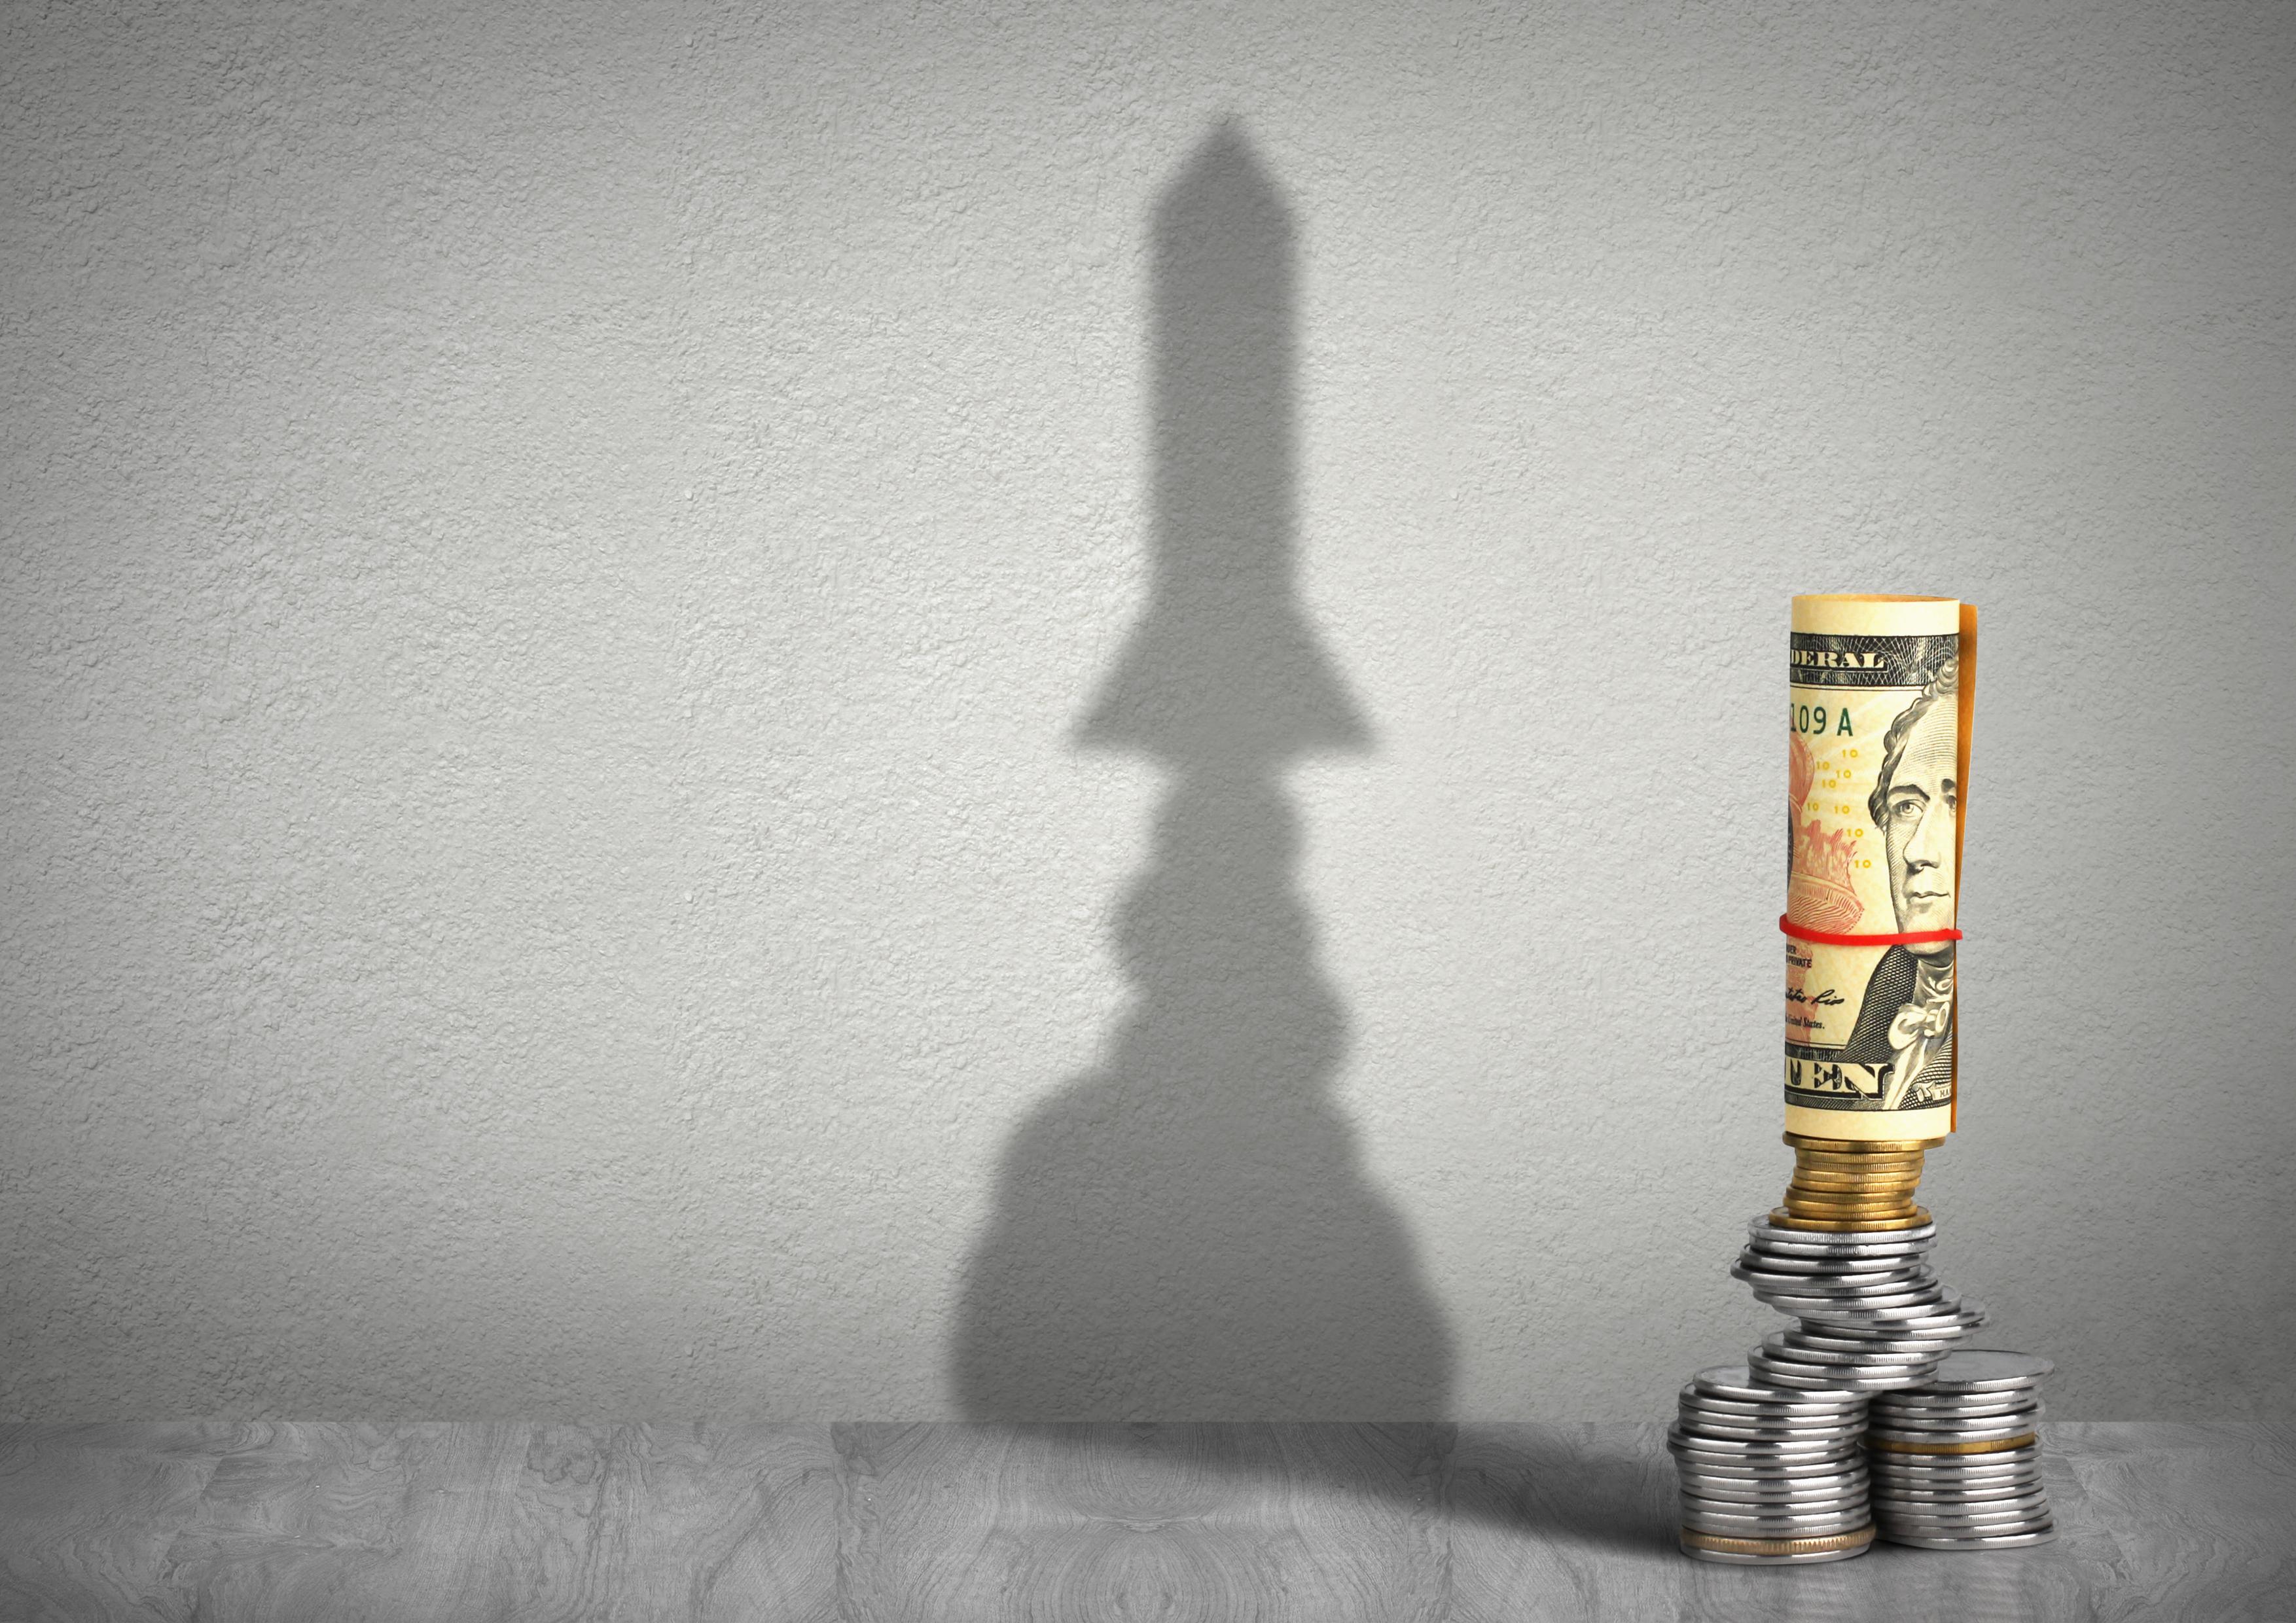 Money casting a rocket shadow